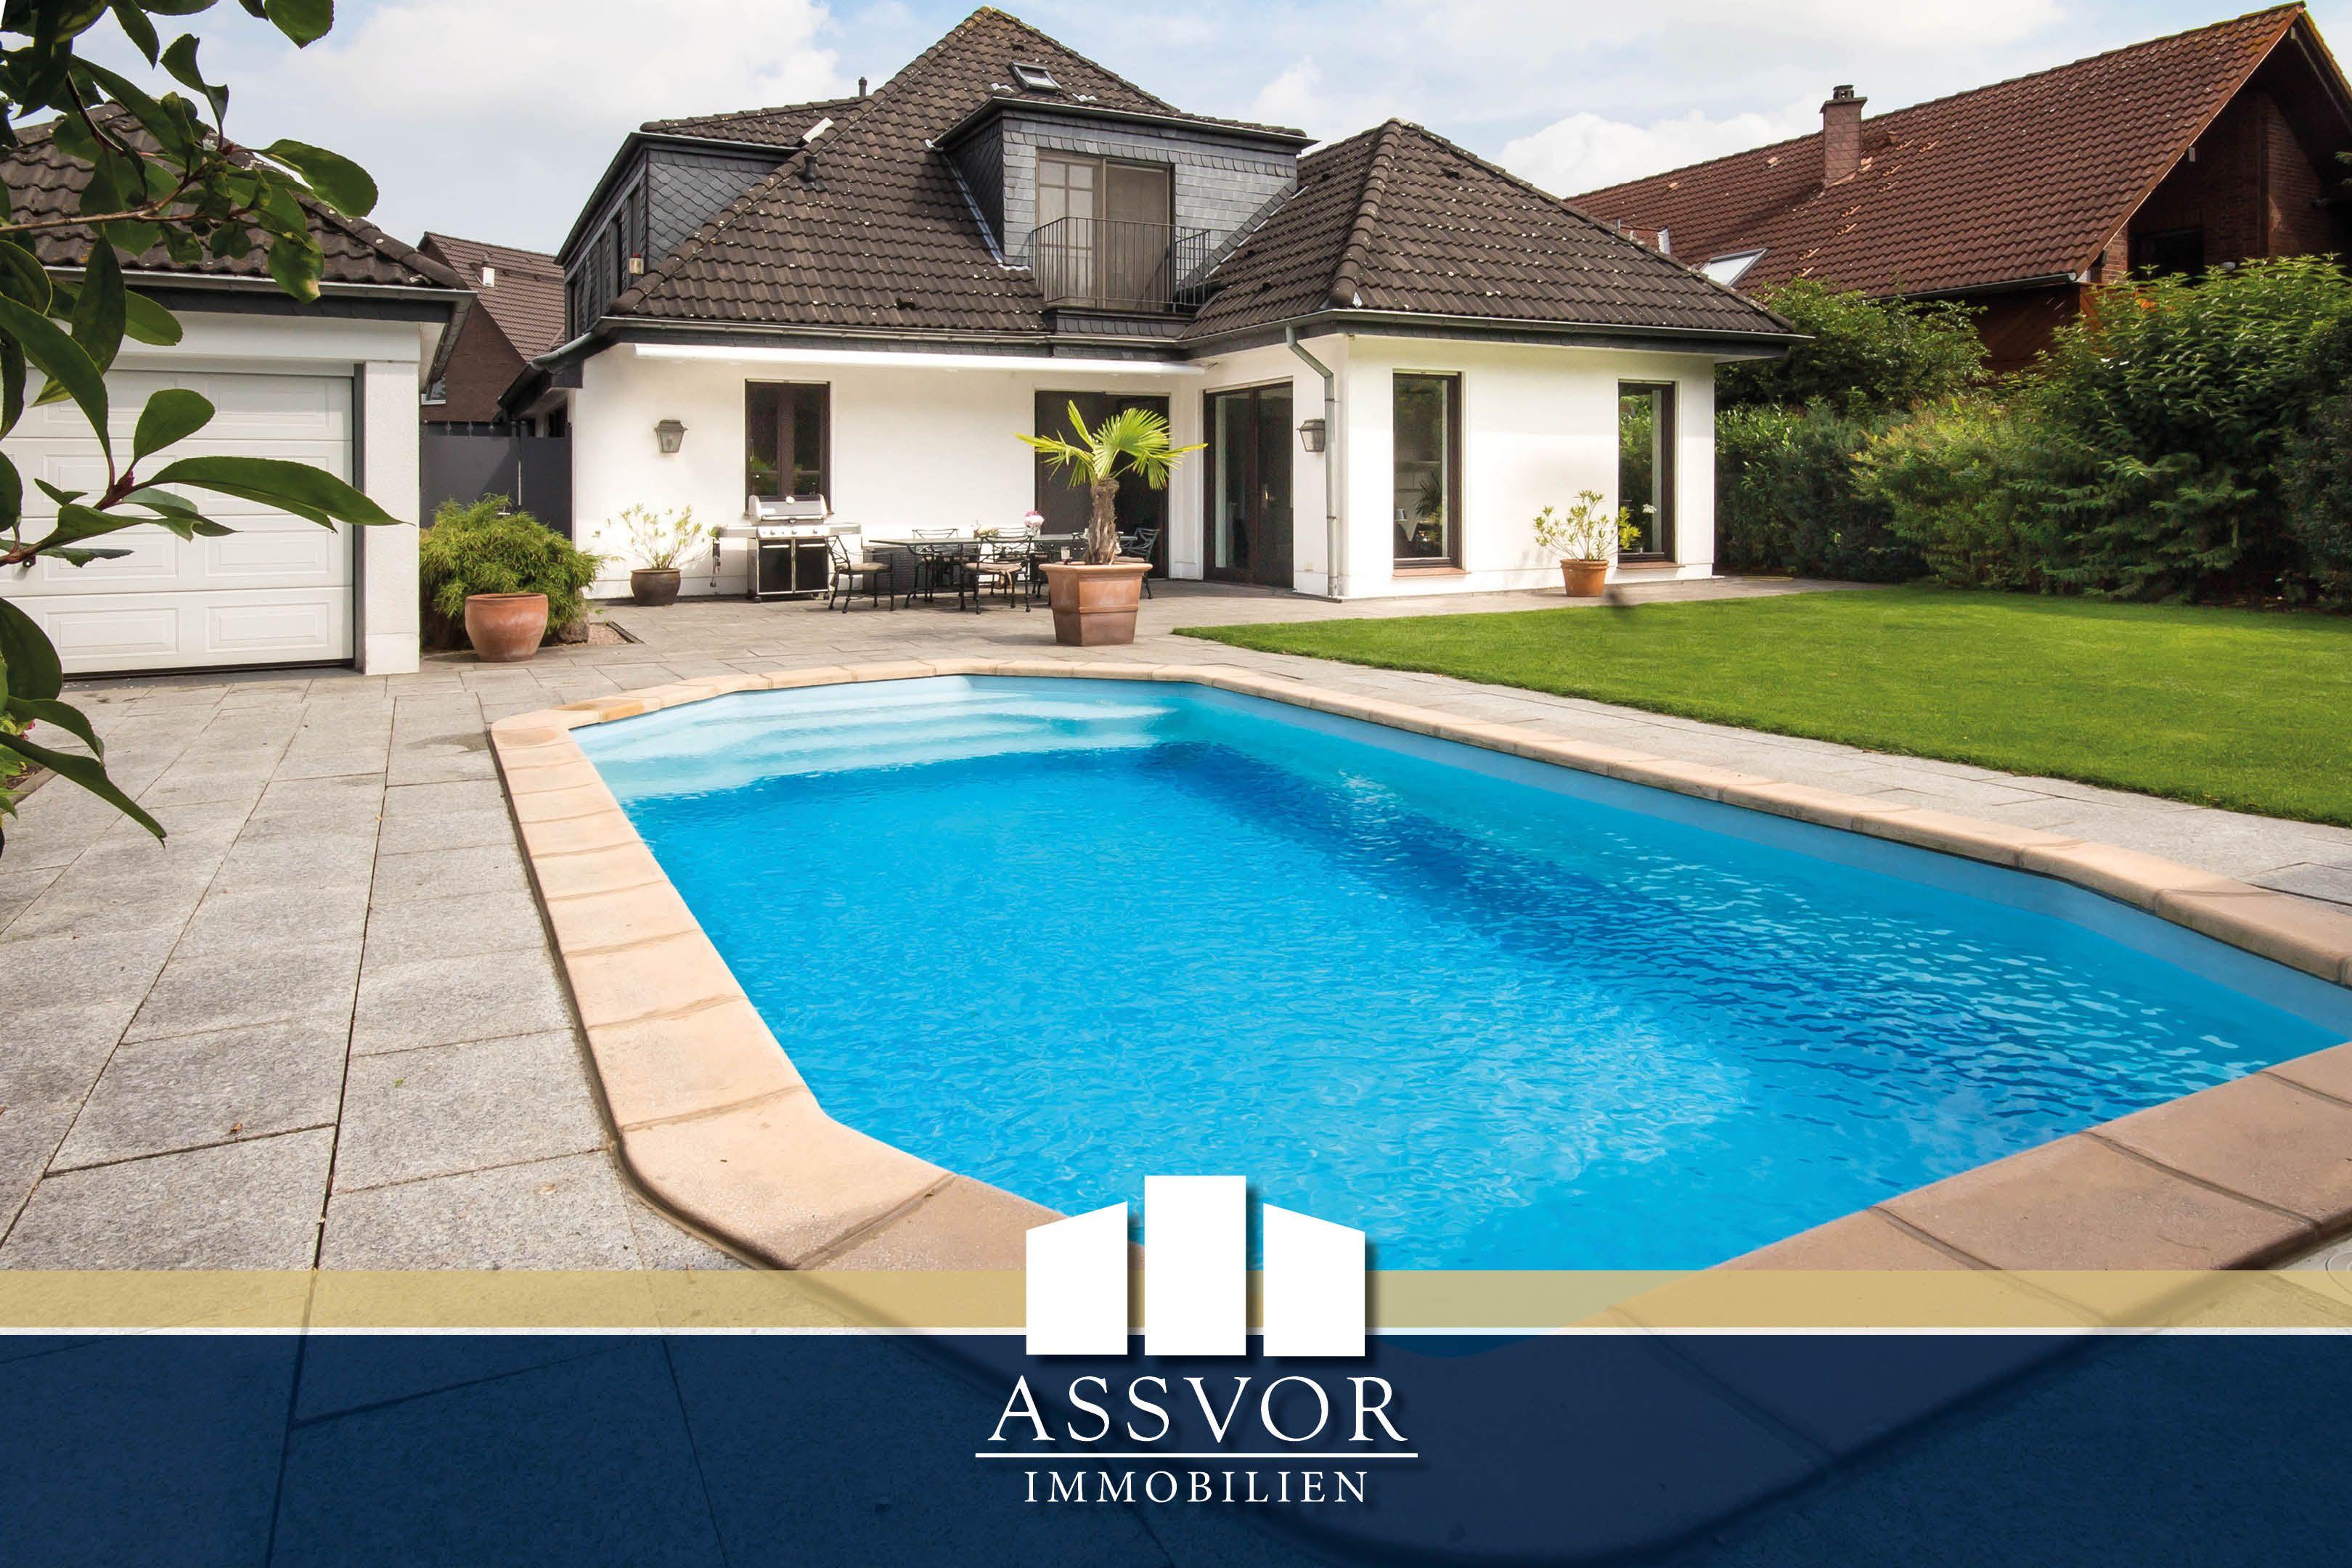 Villa In Duisburg Huckingen Immobilien Duisburg Aktuelle Angebote